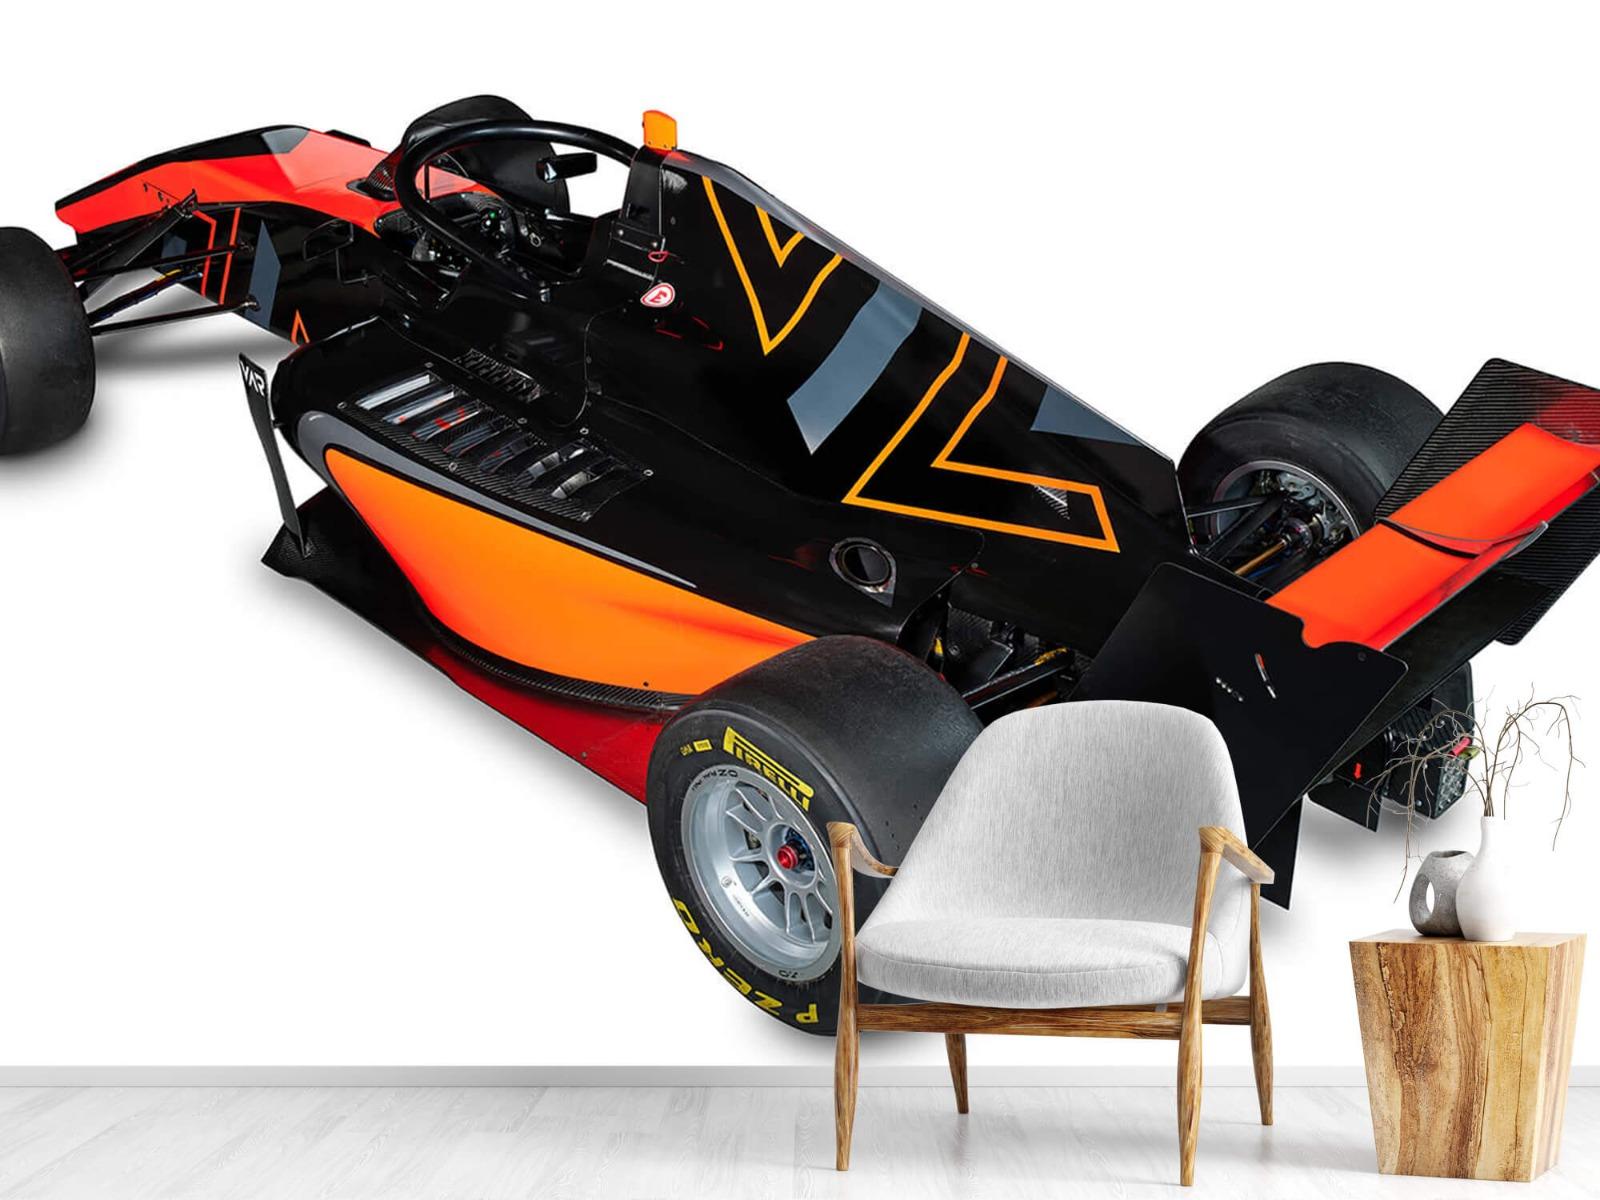 Sportauto's - Formula 3 - Rear left view - Hobbykamer 18